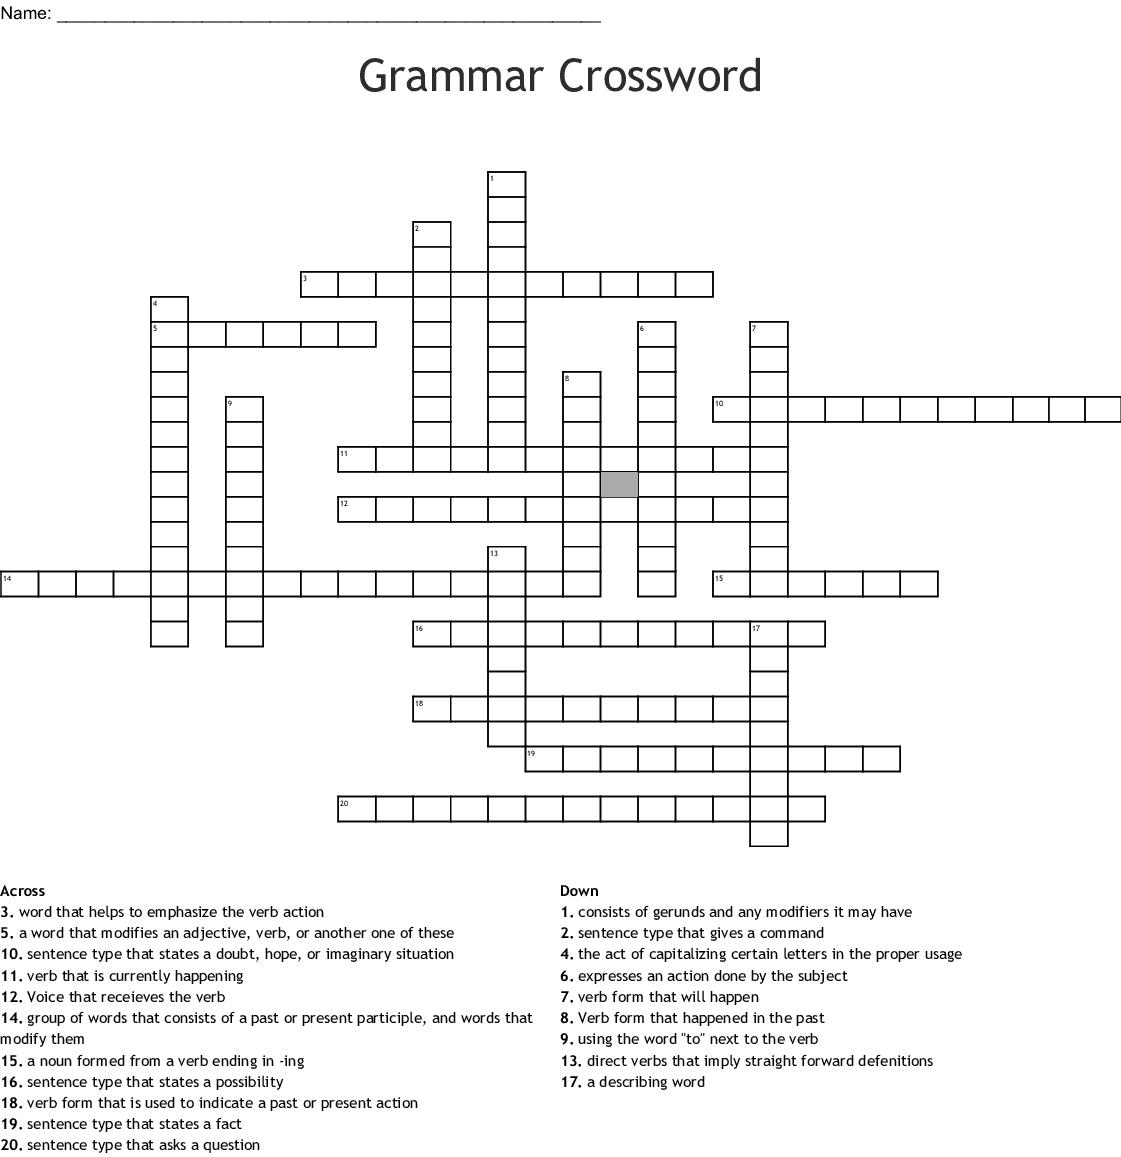 Grammar Crossword Puzzle